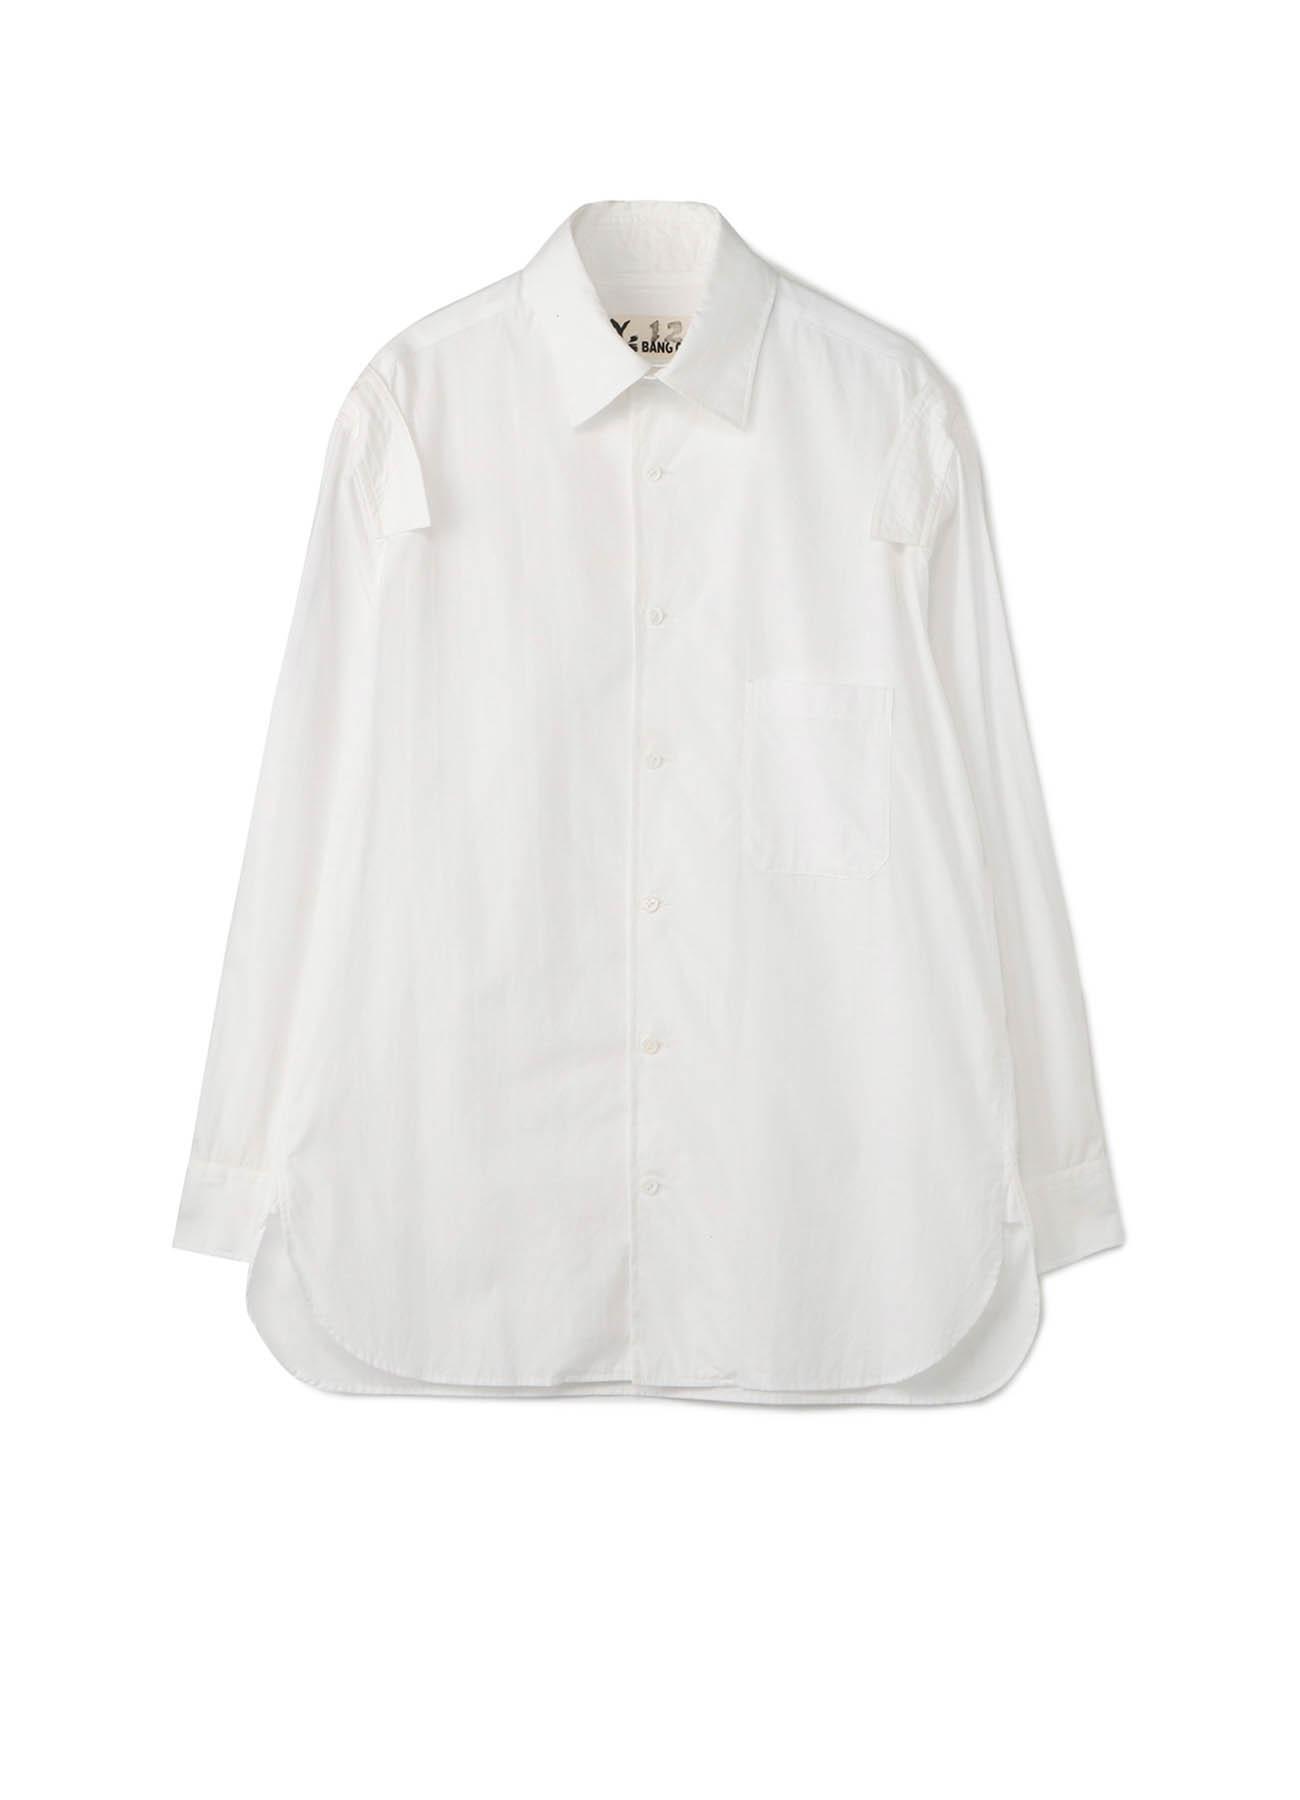 Y's BANG ON!No.122 Stitch tab-shirts Cotton broad